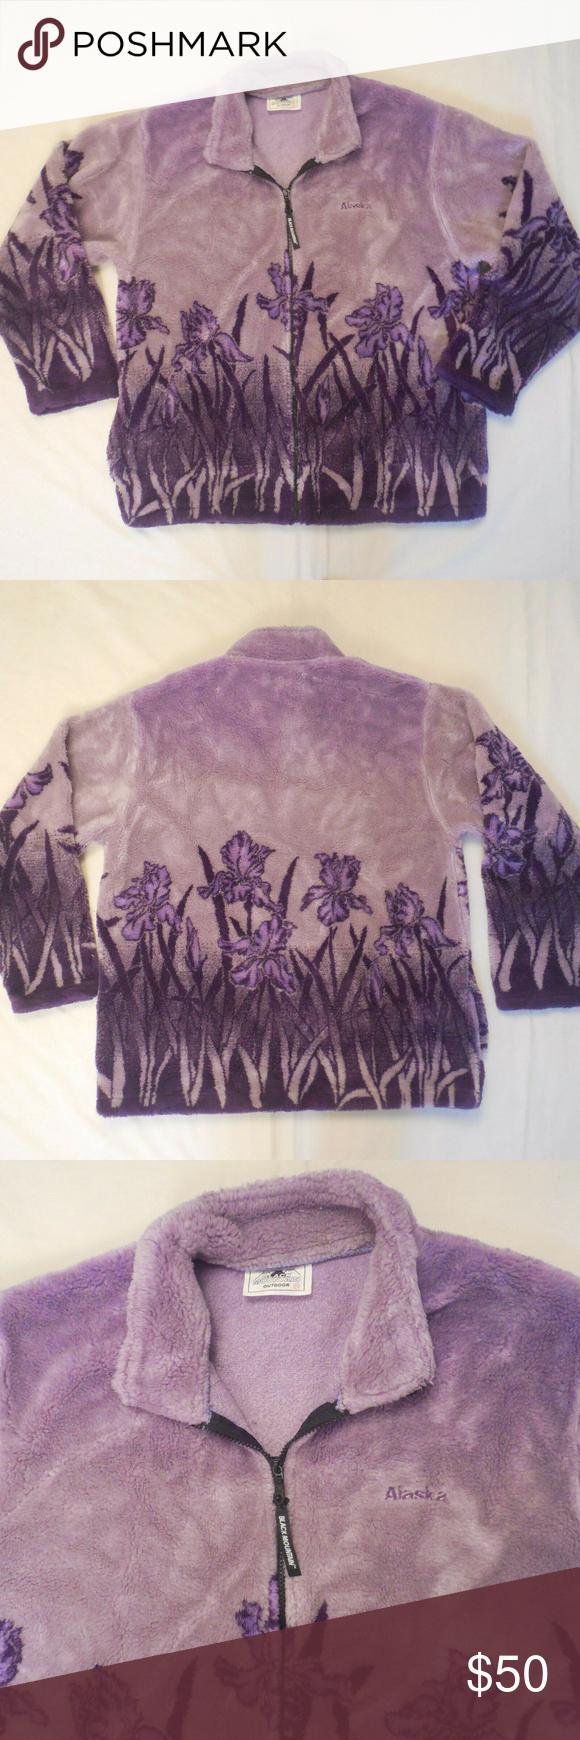 Black Mountain Fleece Jacket Full Zip Alaska Iris Beautiful Black Mountain Outdoor Fleece Jacket With Purple Iris Flower Fleece Jacket Jackets For Women Fleece [ 1740 x 580 Pixel ]